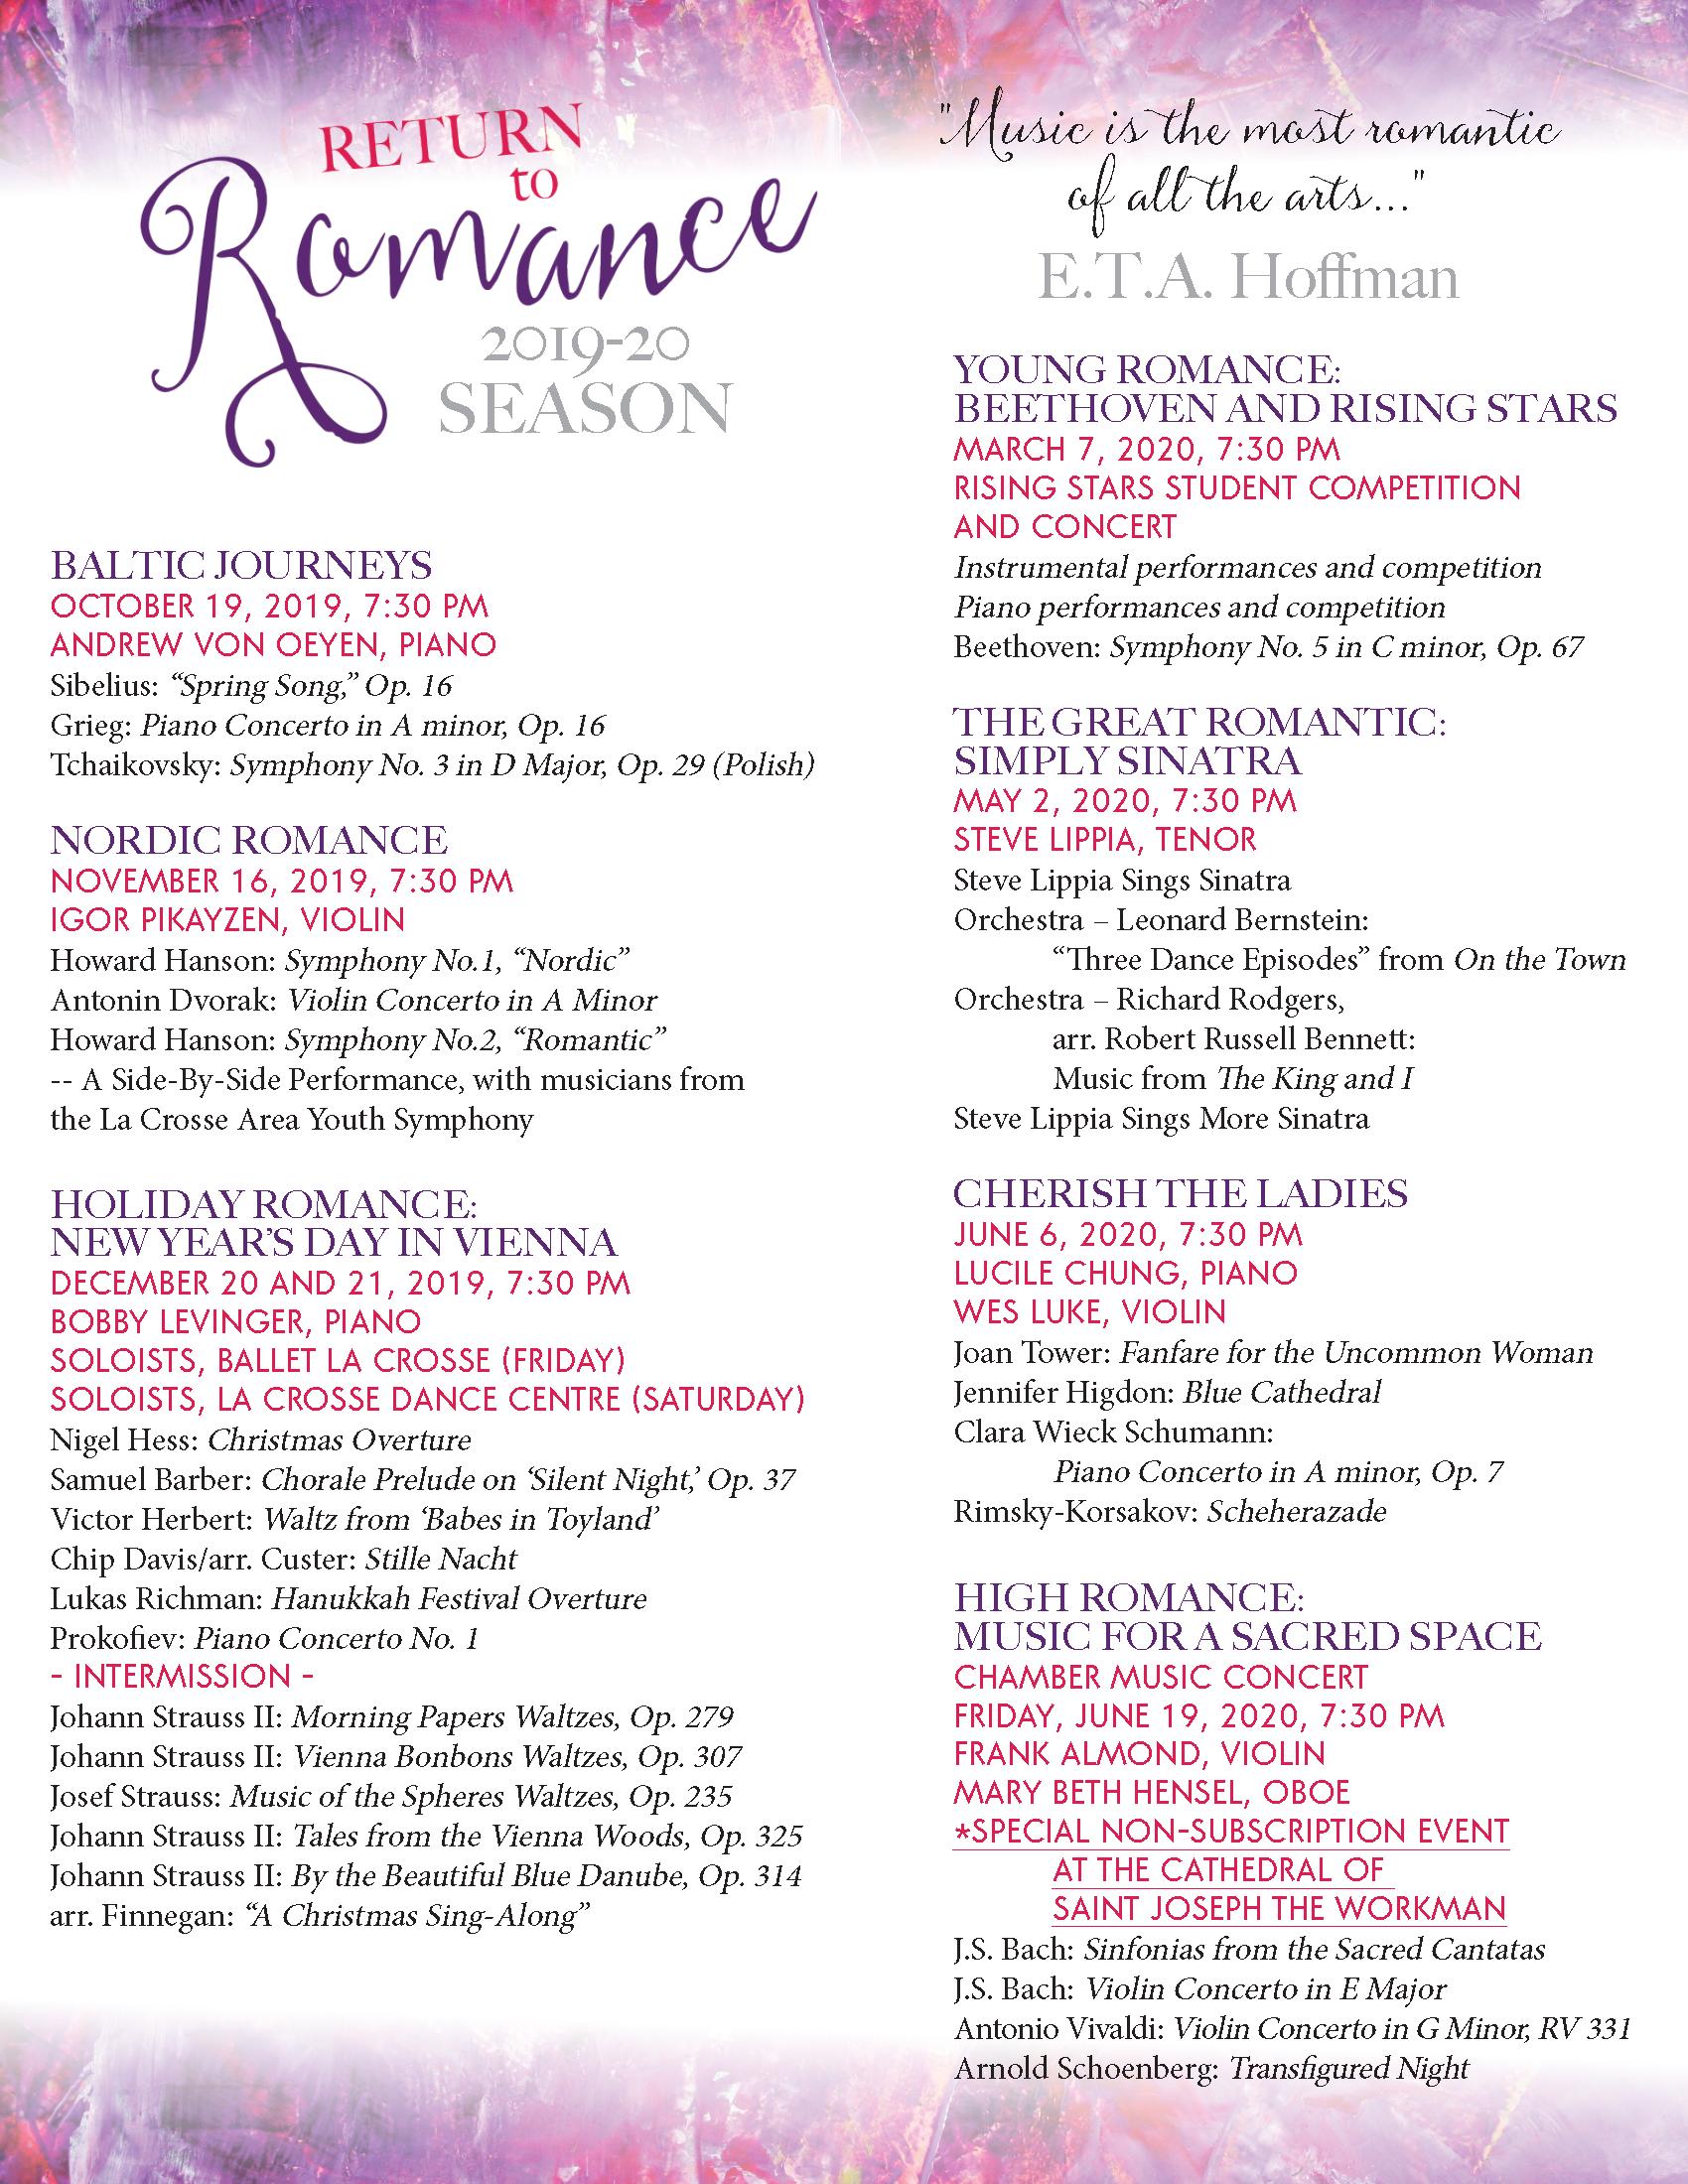 La Crosse Symphony Orchestra's 'Holiday Romance: New Year's